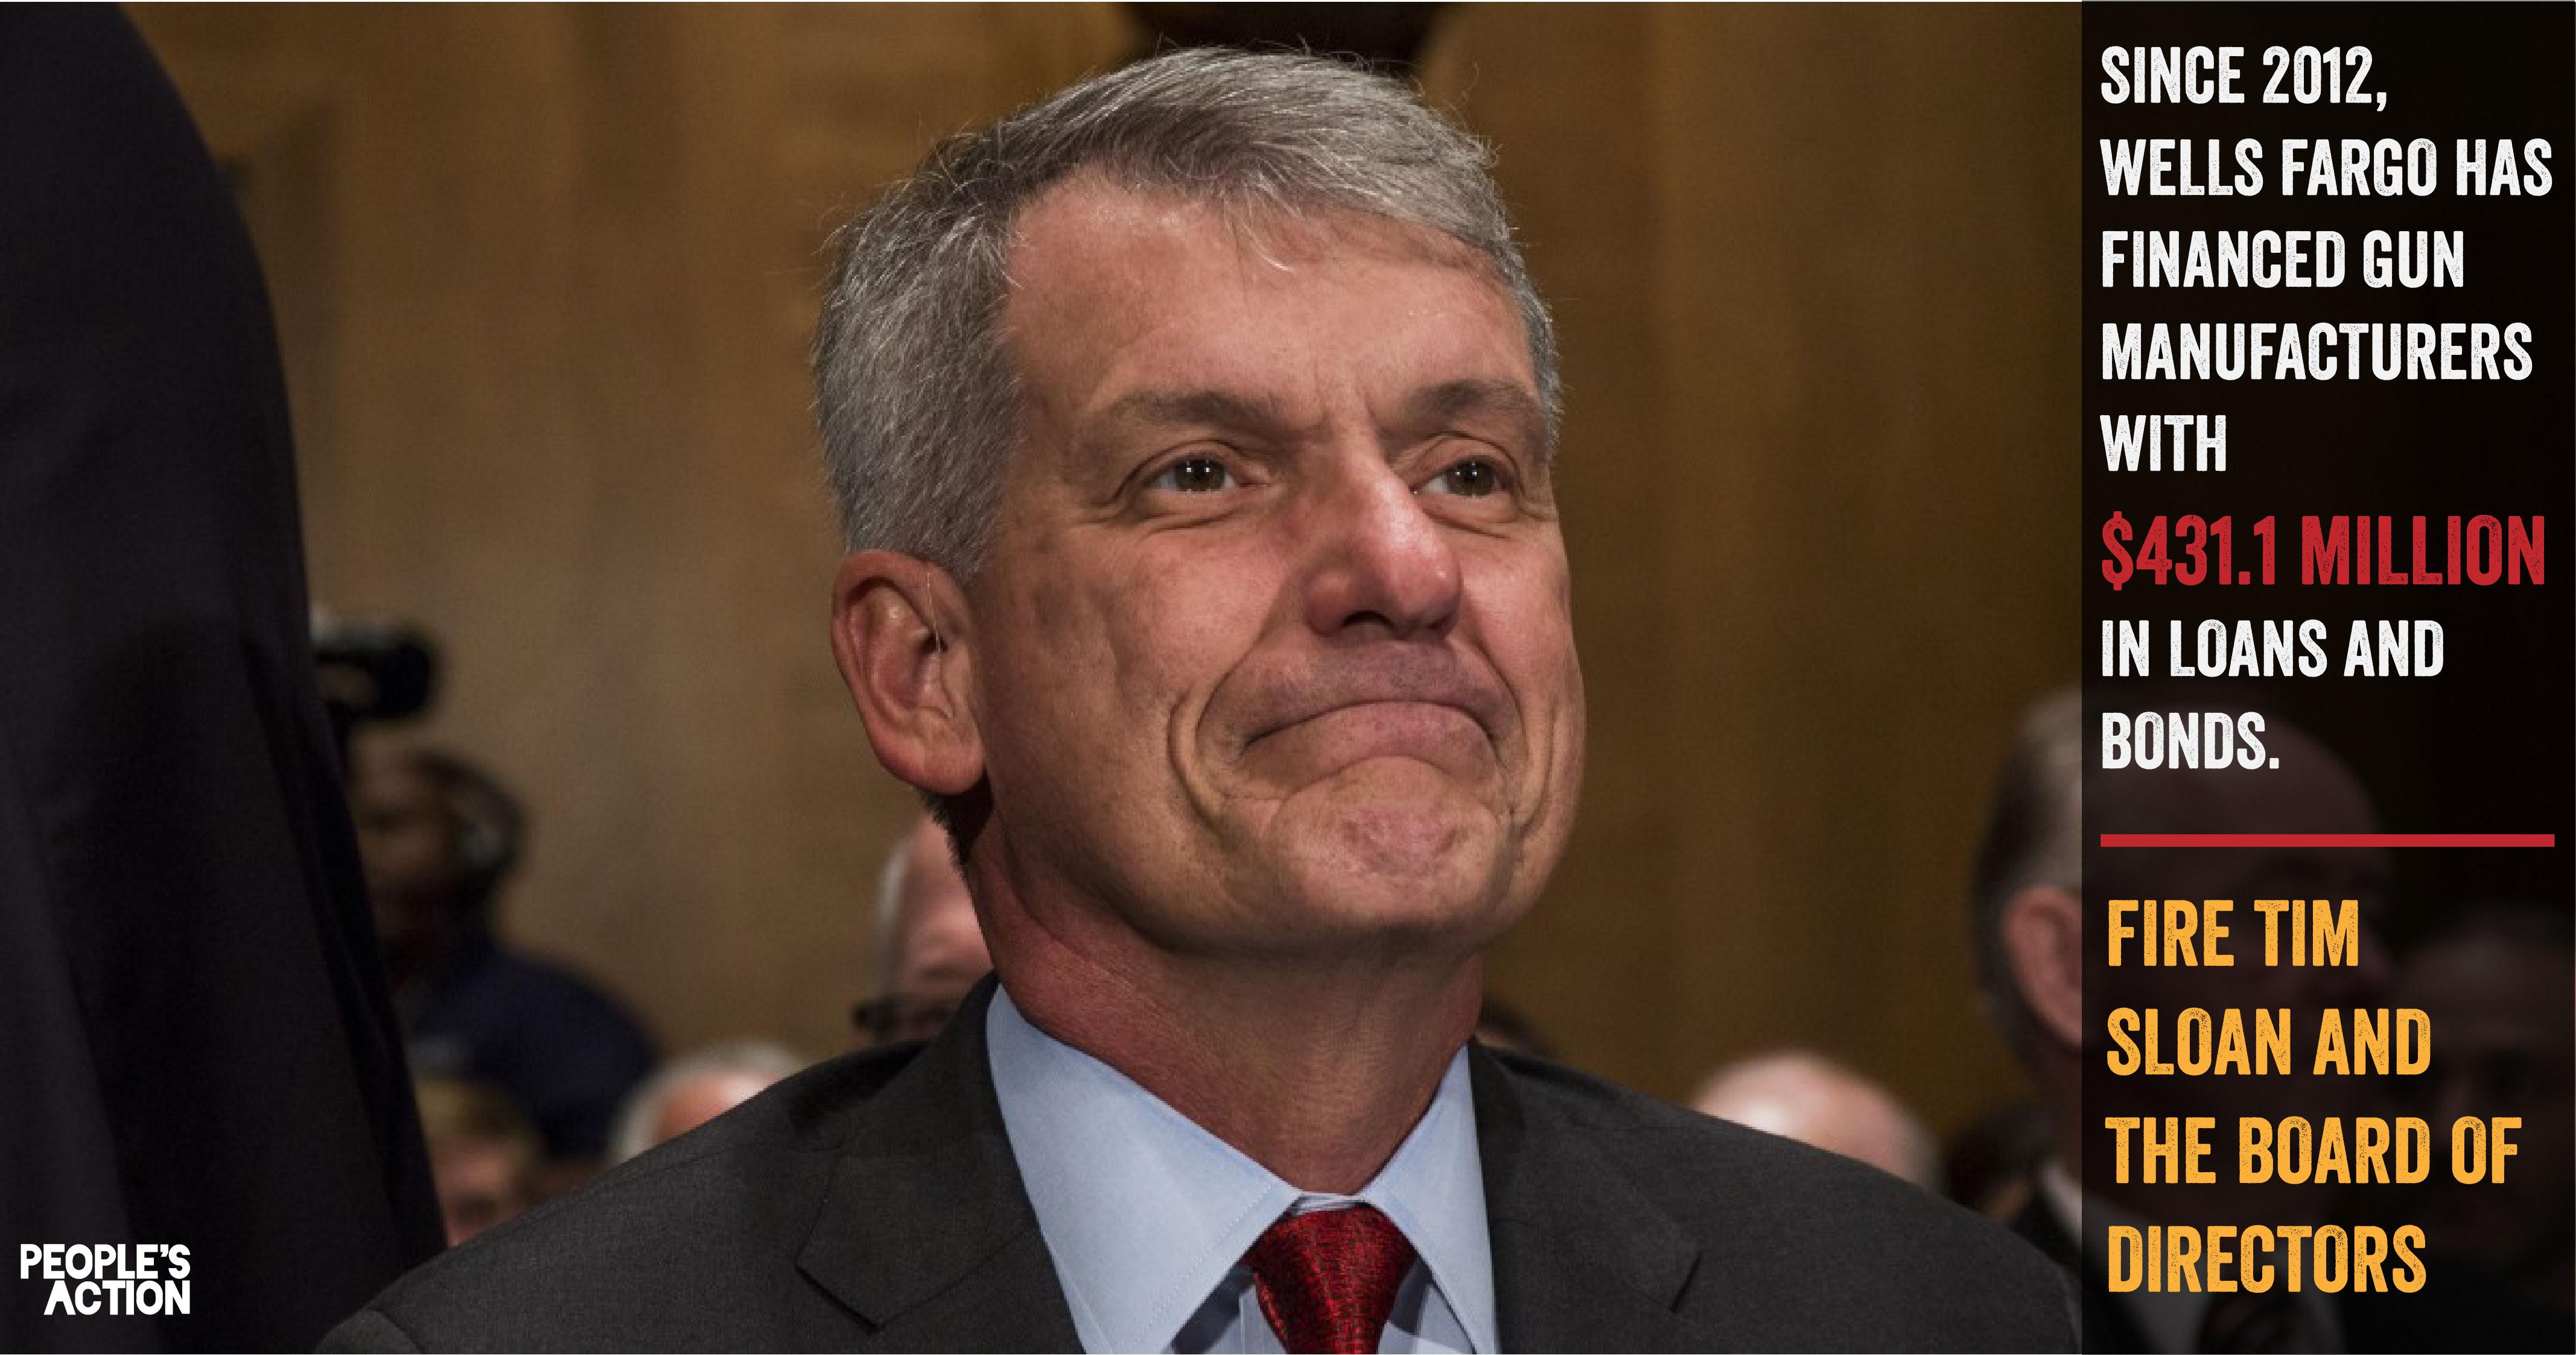 Demand change at Wells Fargo